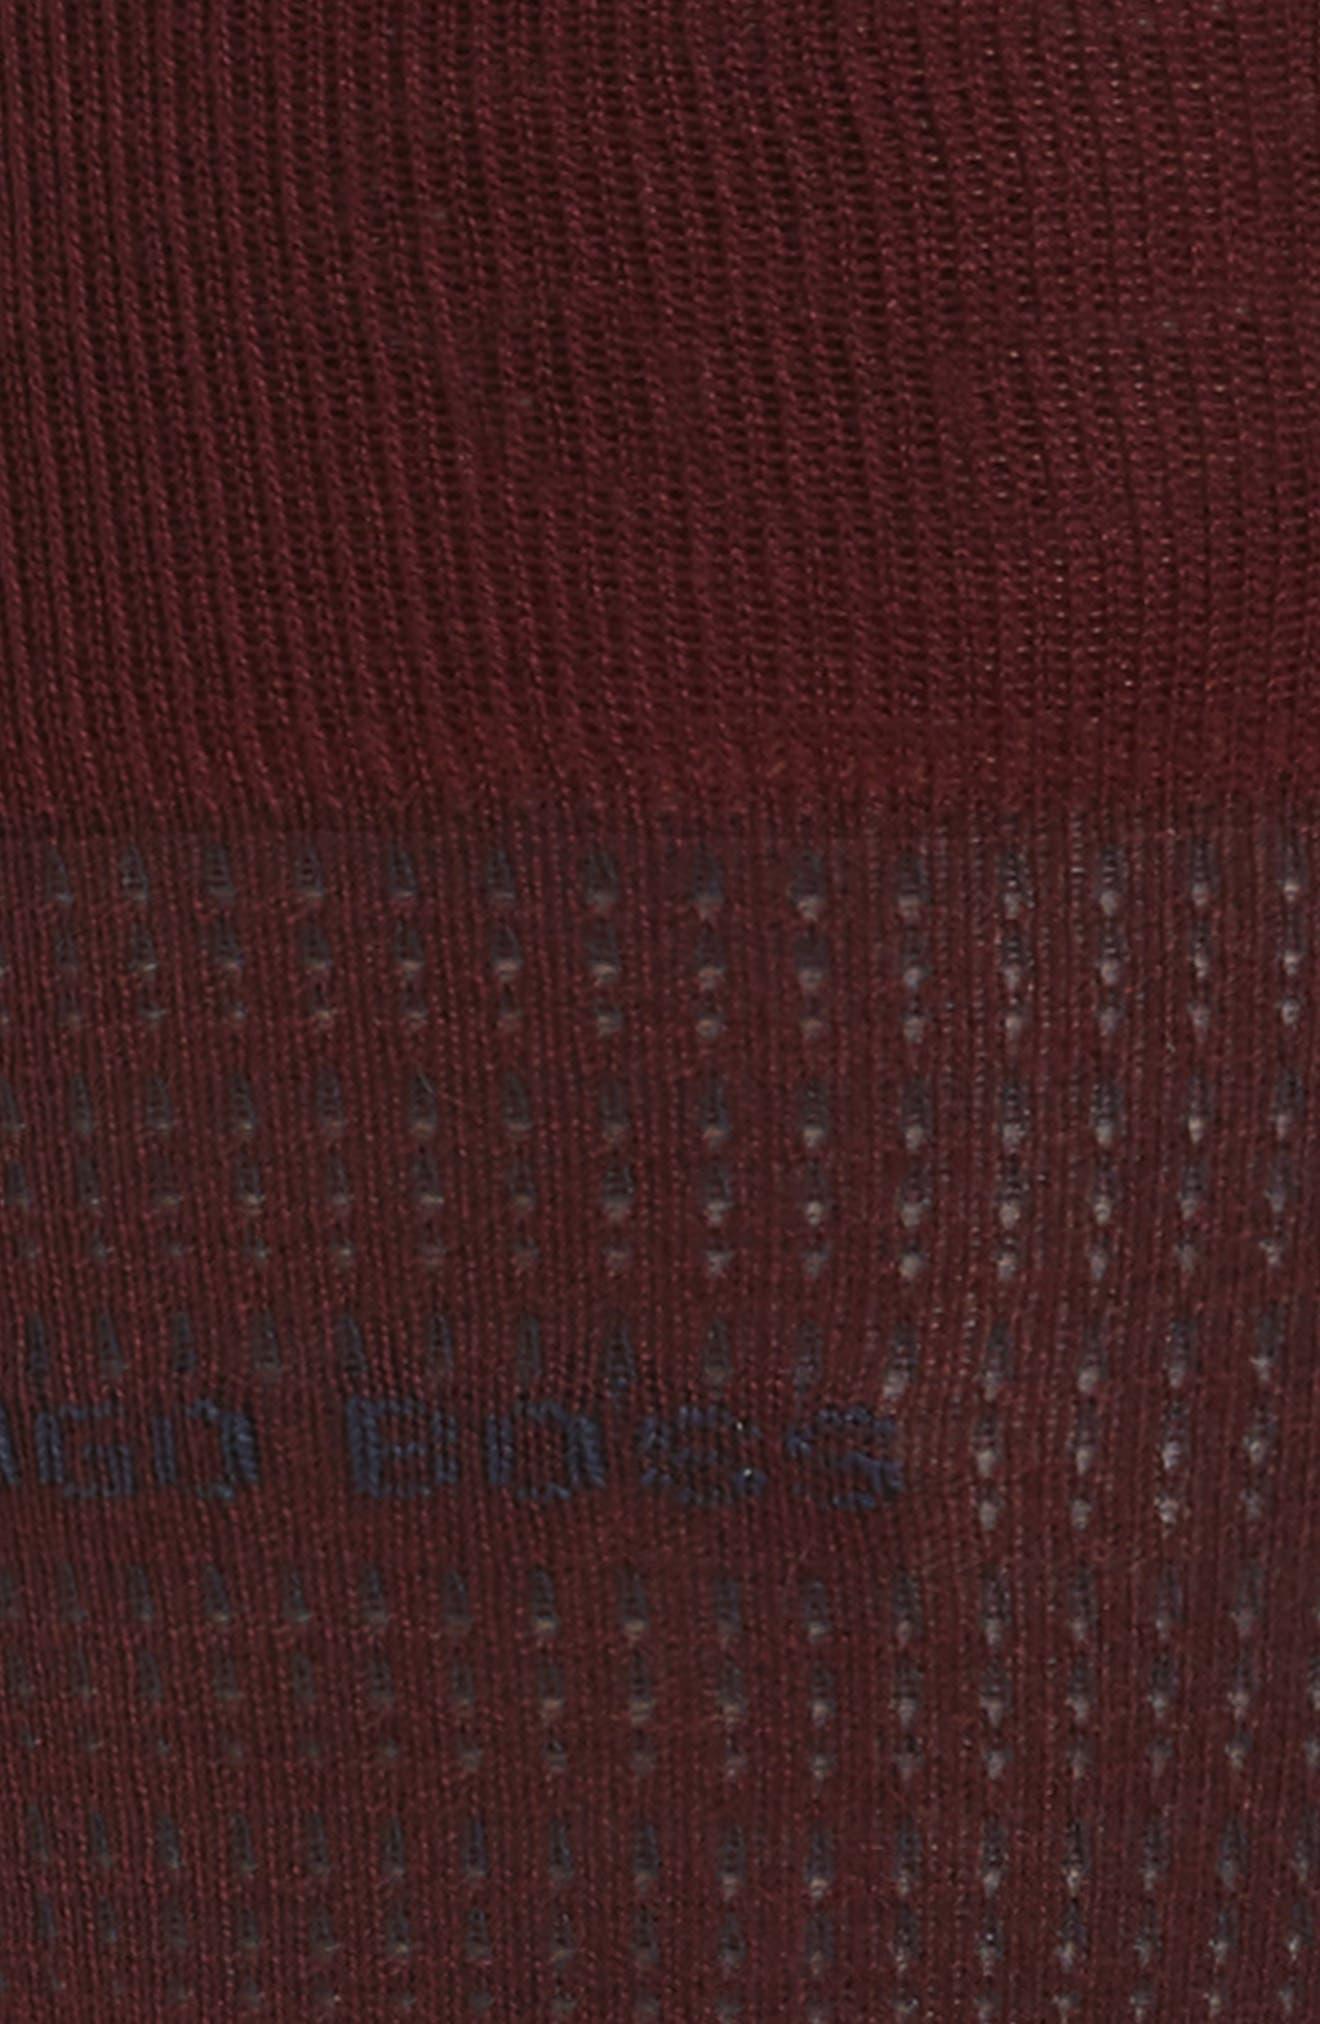 Micro Jacquard Socks,                             Alternate thumbnail 2, color,                             Dark Red